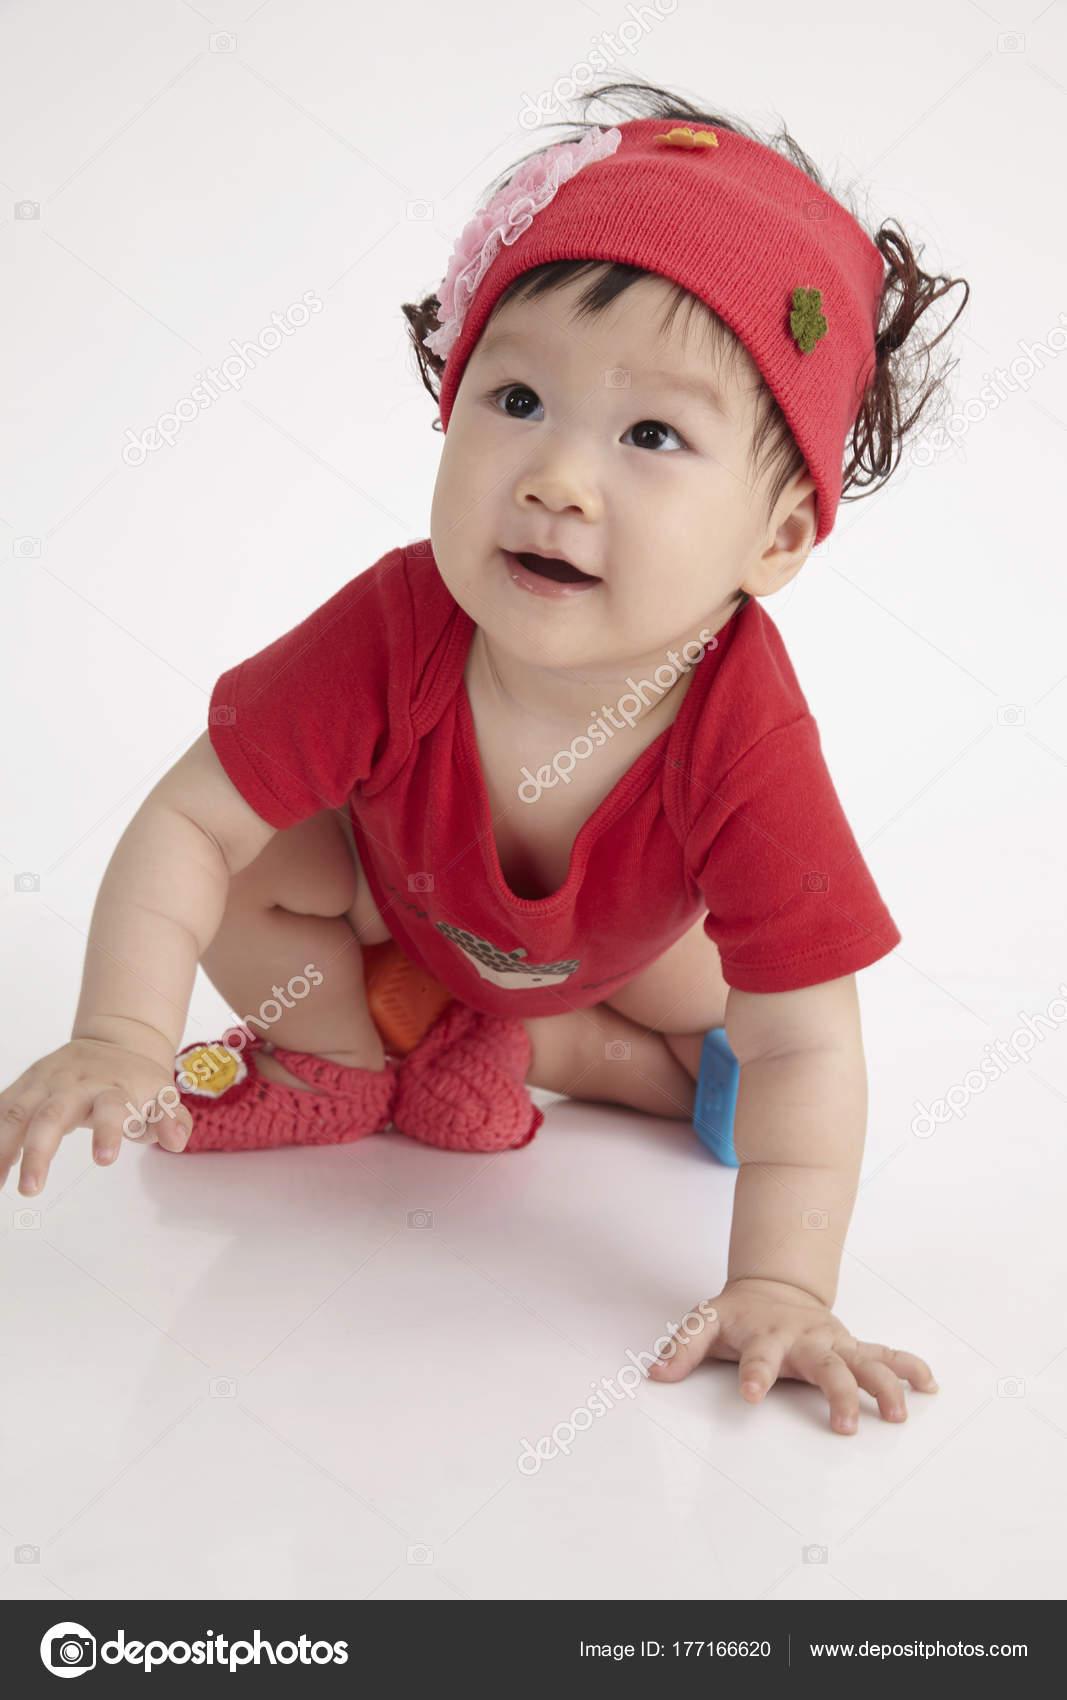 Close Chinese Baby Red Hair Band — Stock Photo © eskaylim  177166620 564bf505355